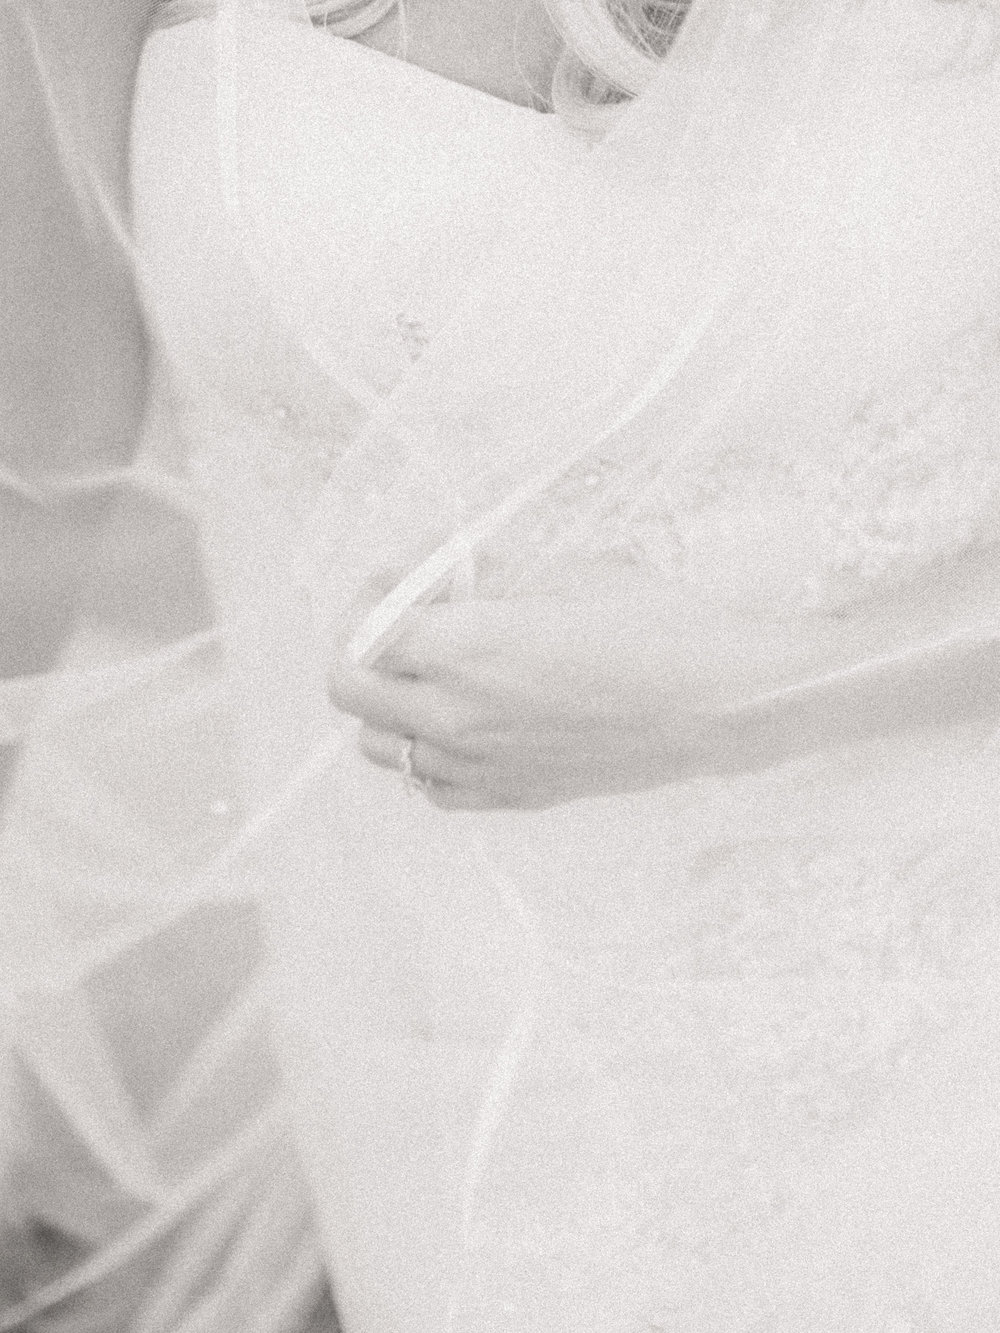 Elegant Organic Fall Swedish Bridal Wedding Styled Shoot - Erika Alvarenga Photography-39.jpg